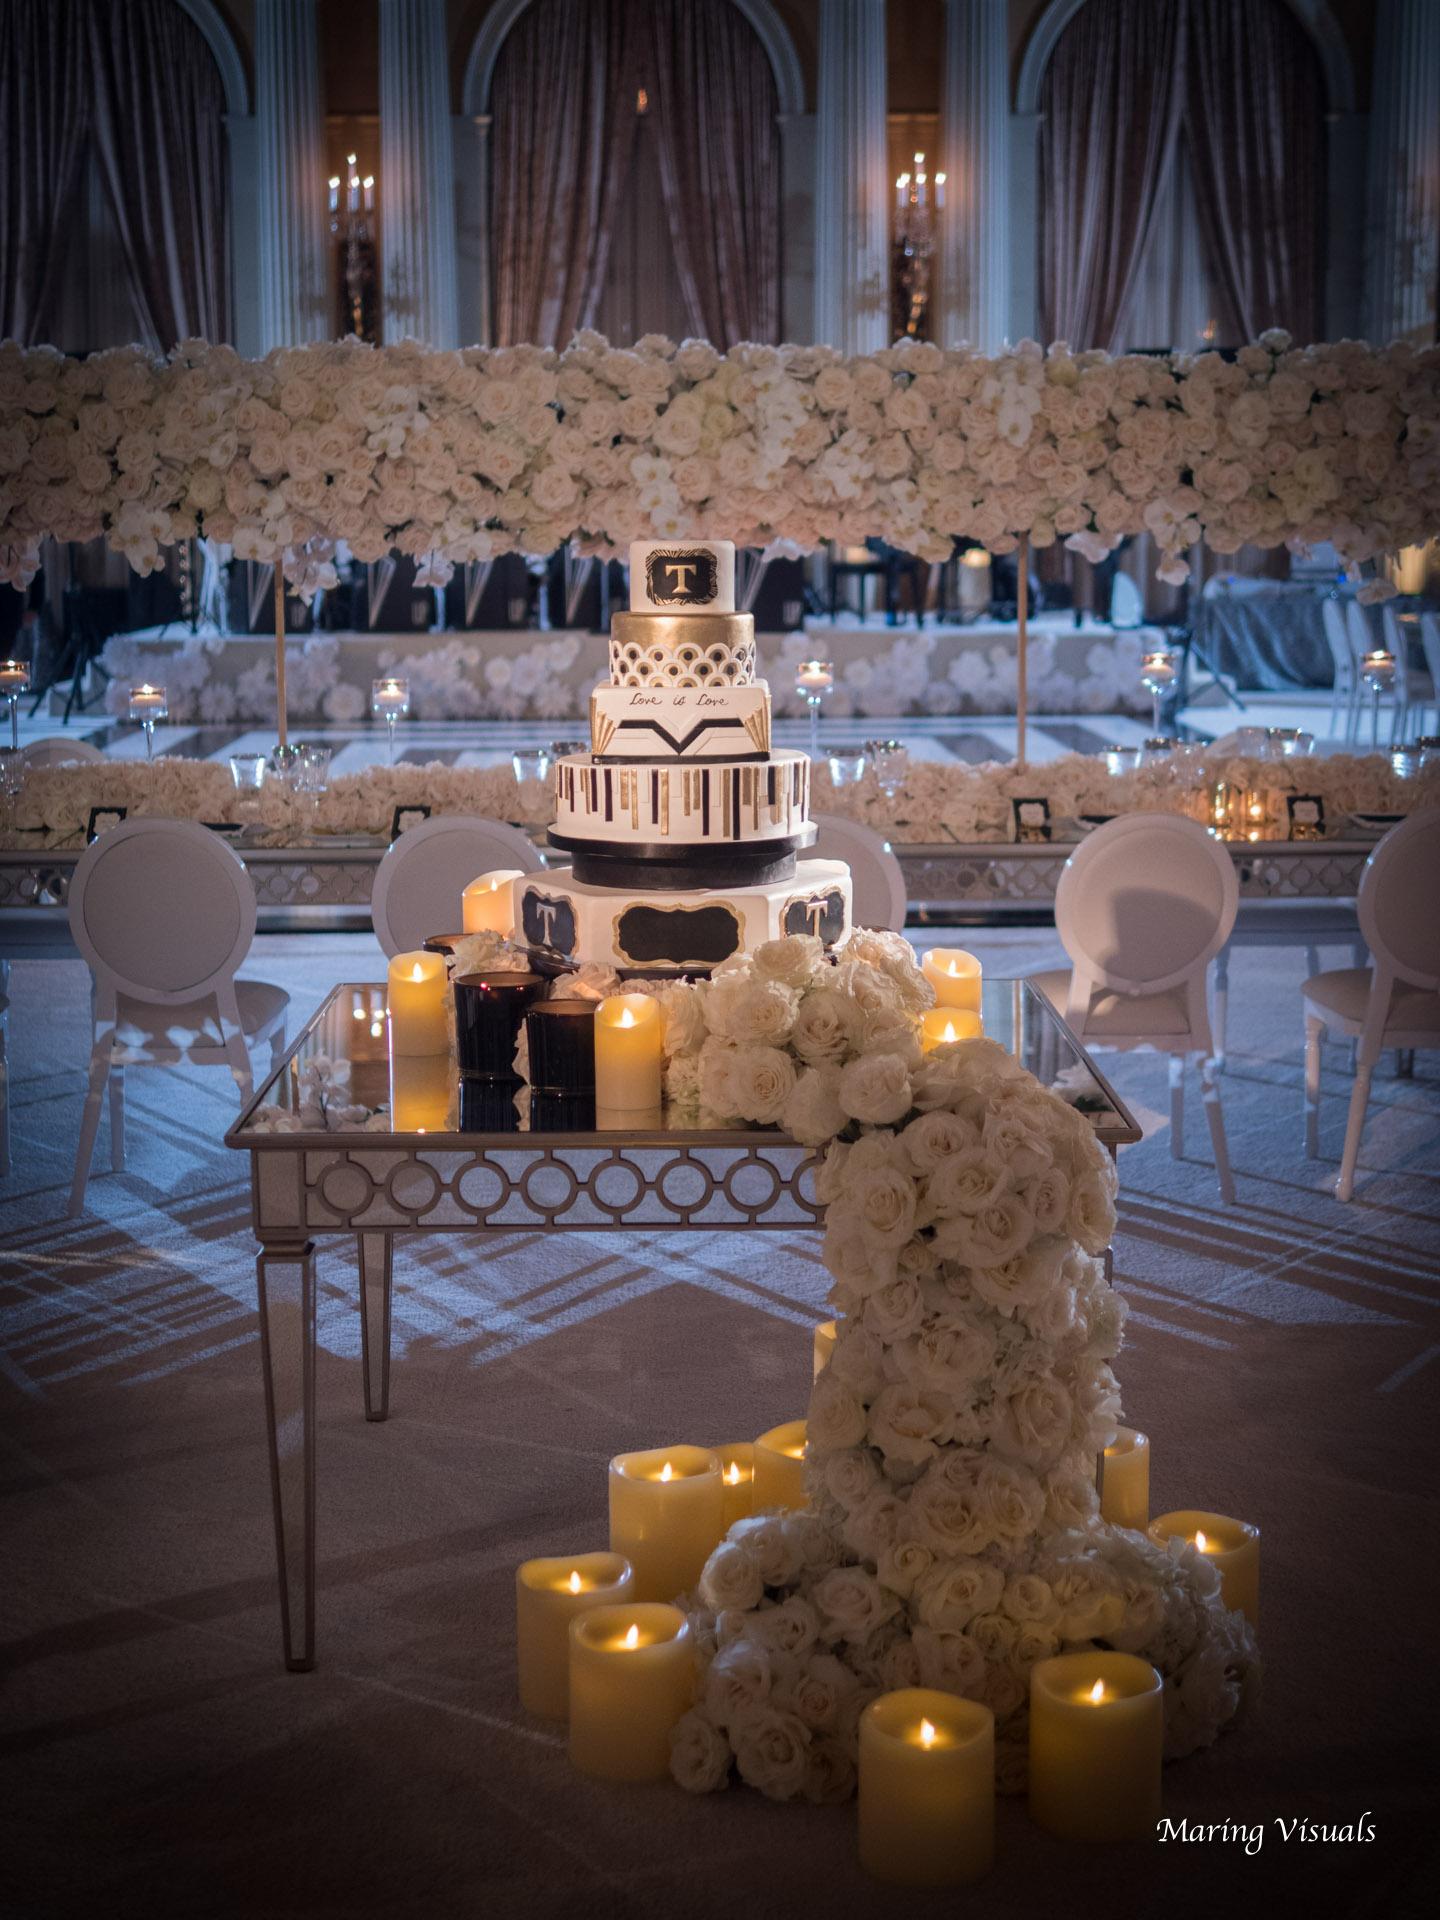 David Tutera Weddings by Maring Visuals 00549.jpg